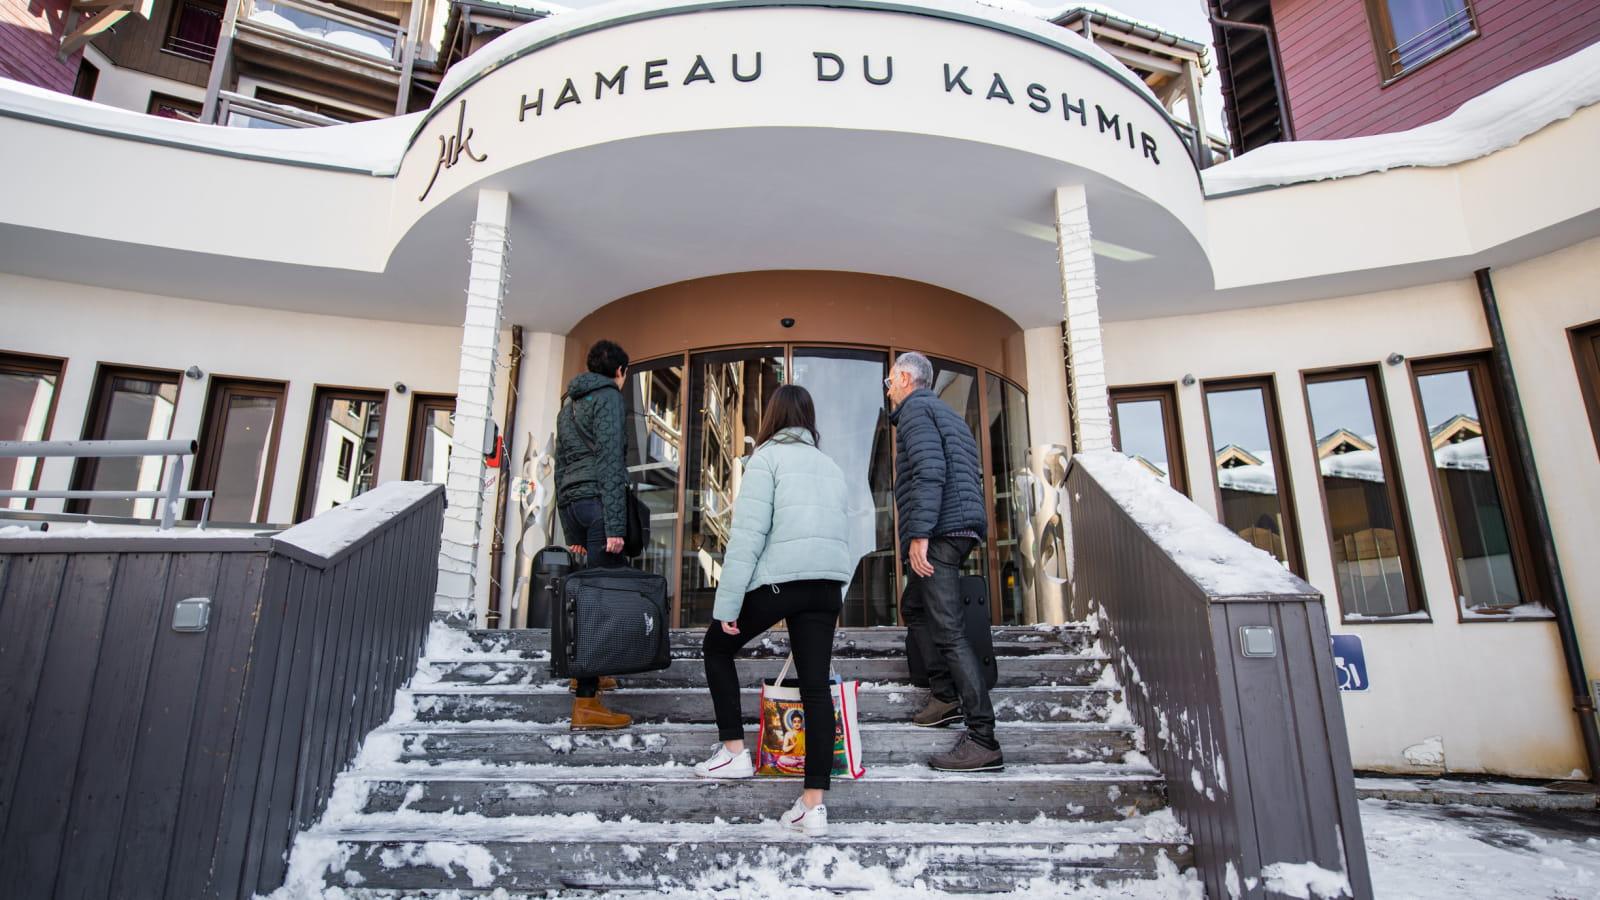 Your arrival at the Hameau du Kashmir in Val Thorens